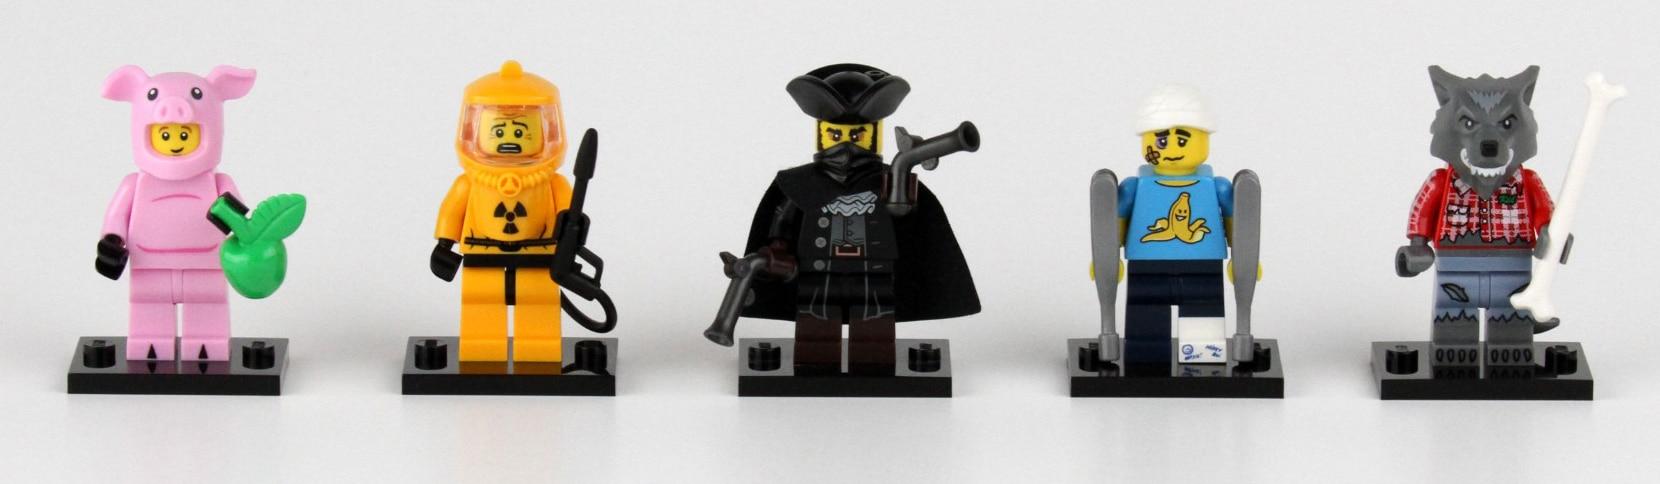 LEGO Minifiguren Adventskalender Lösung